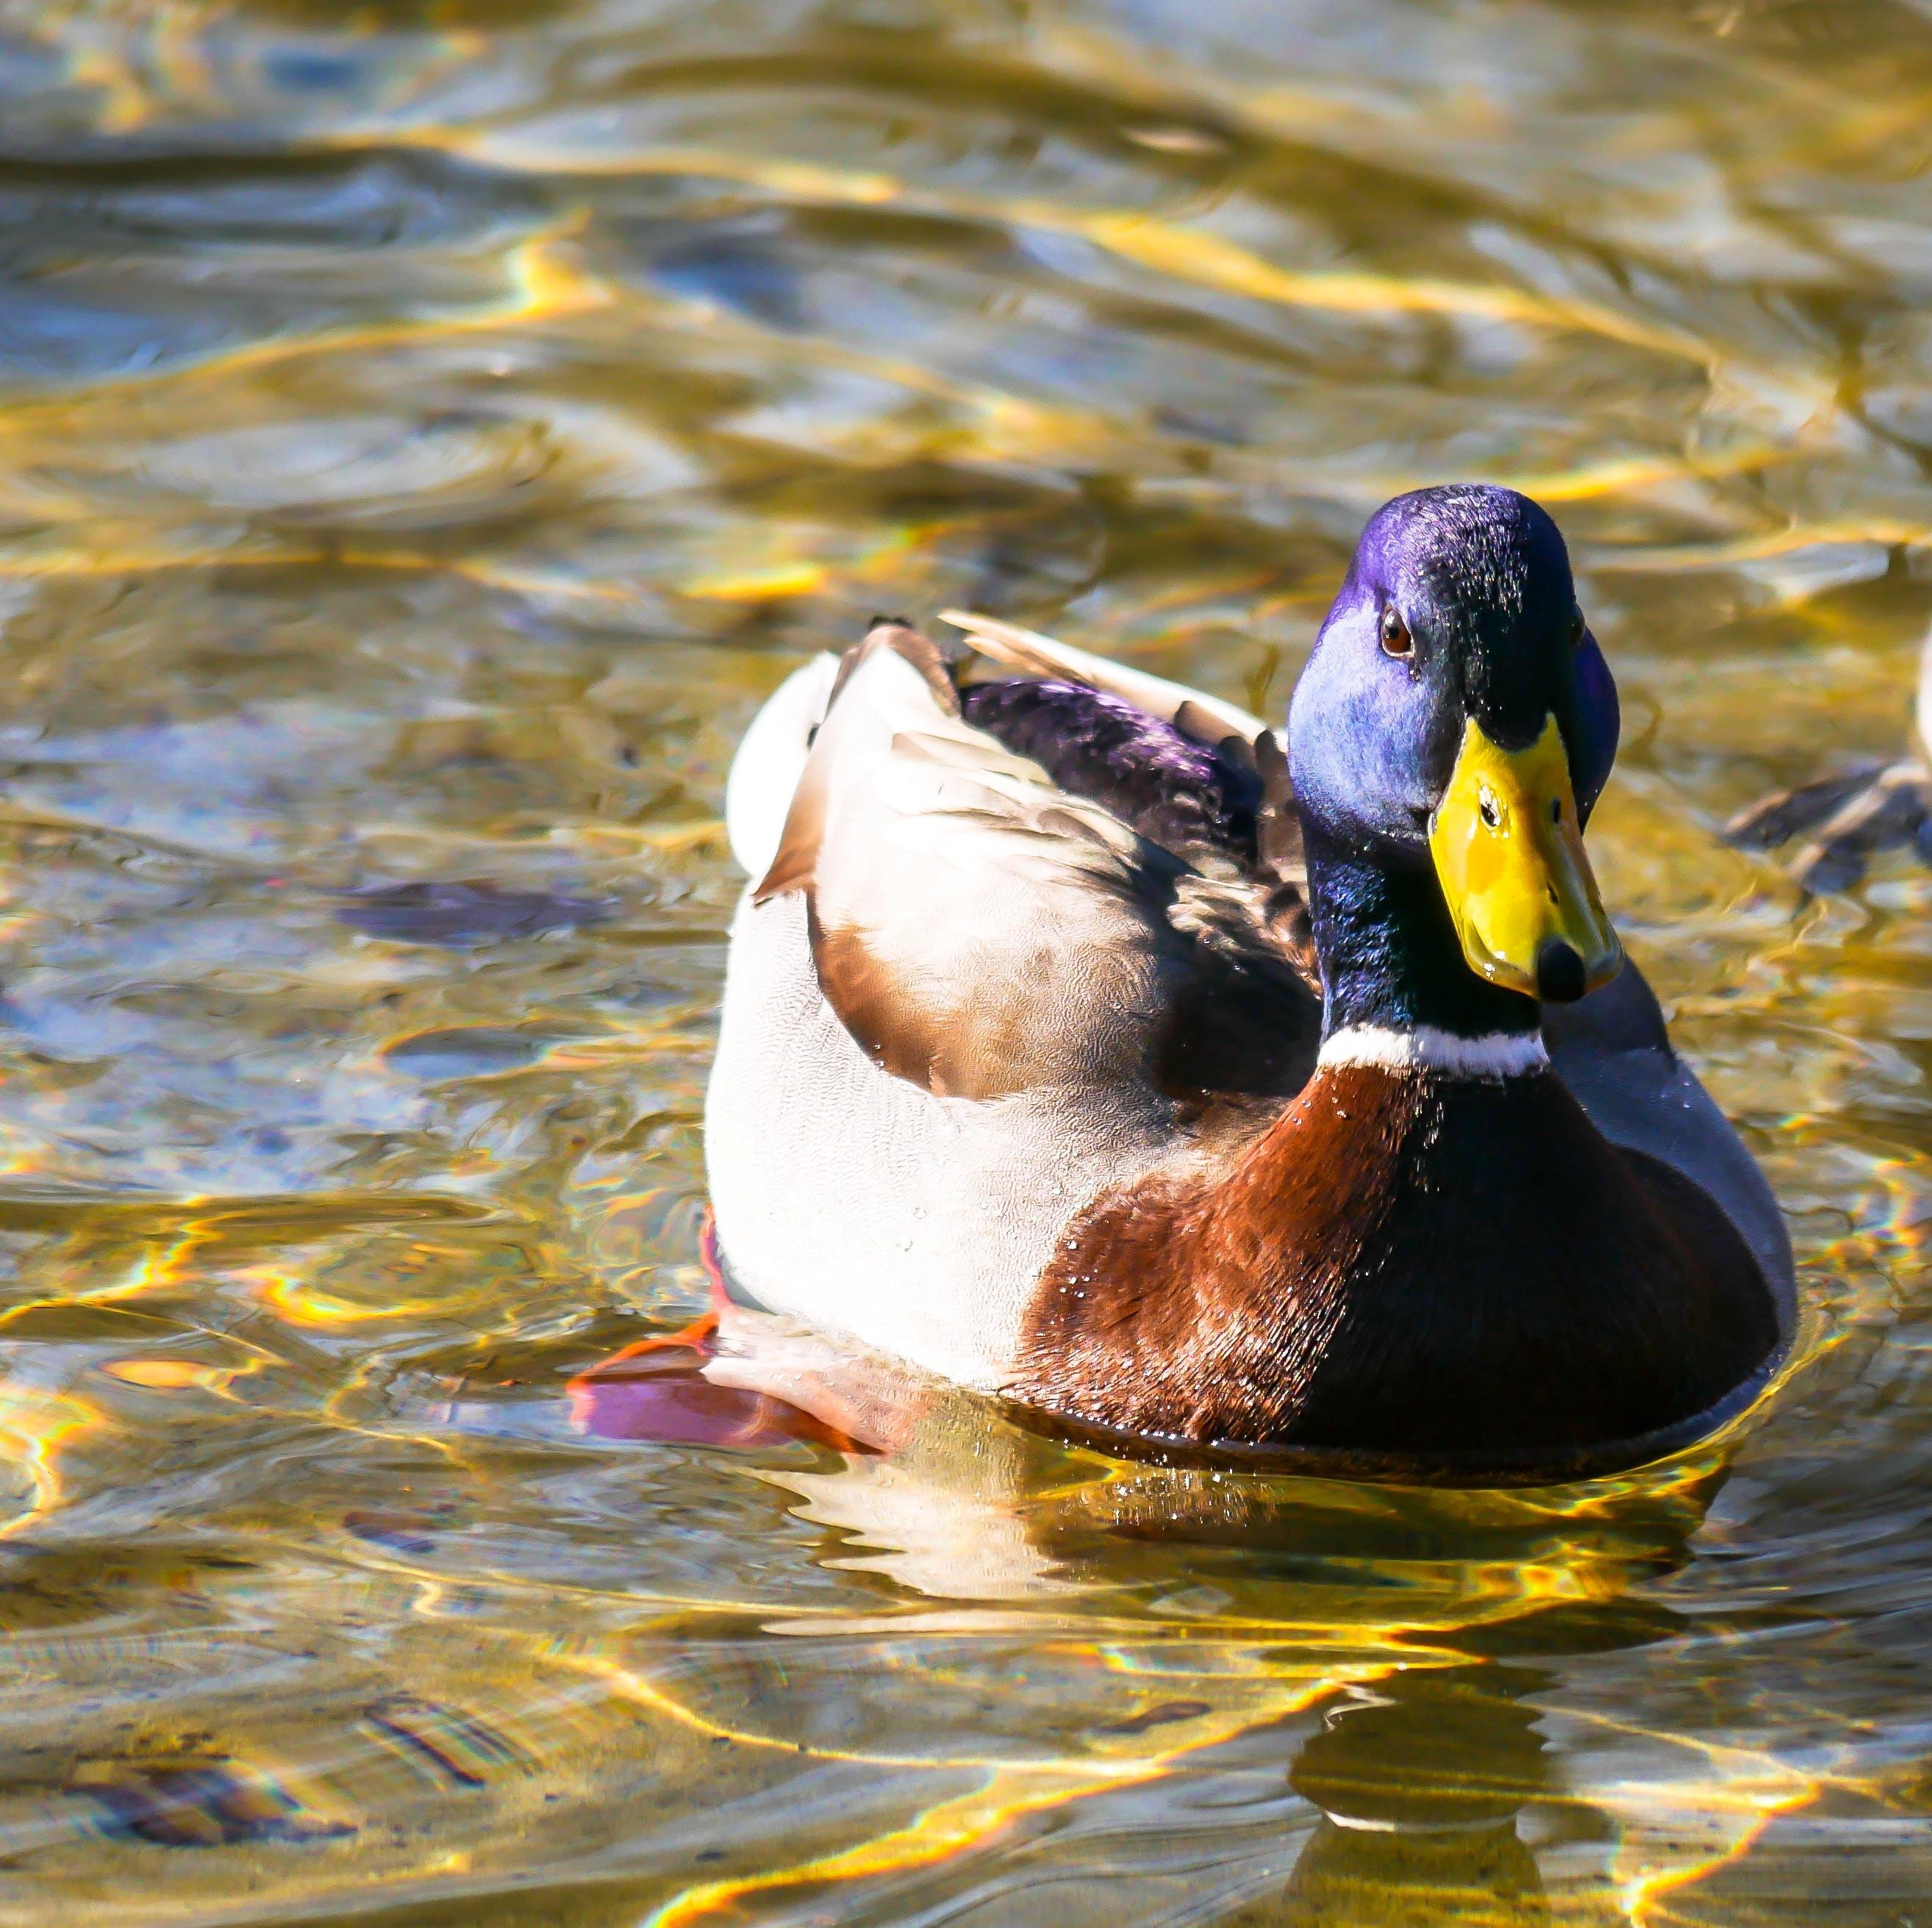 Free stock photo of purple, yellow, animal, duck